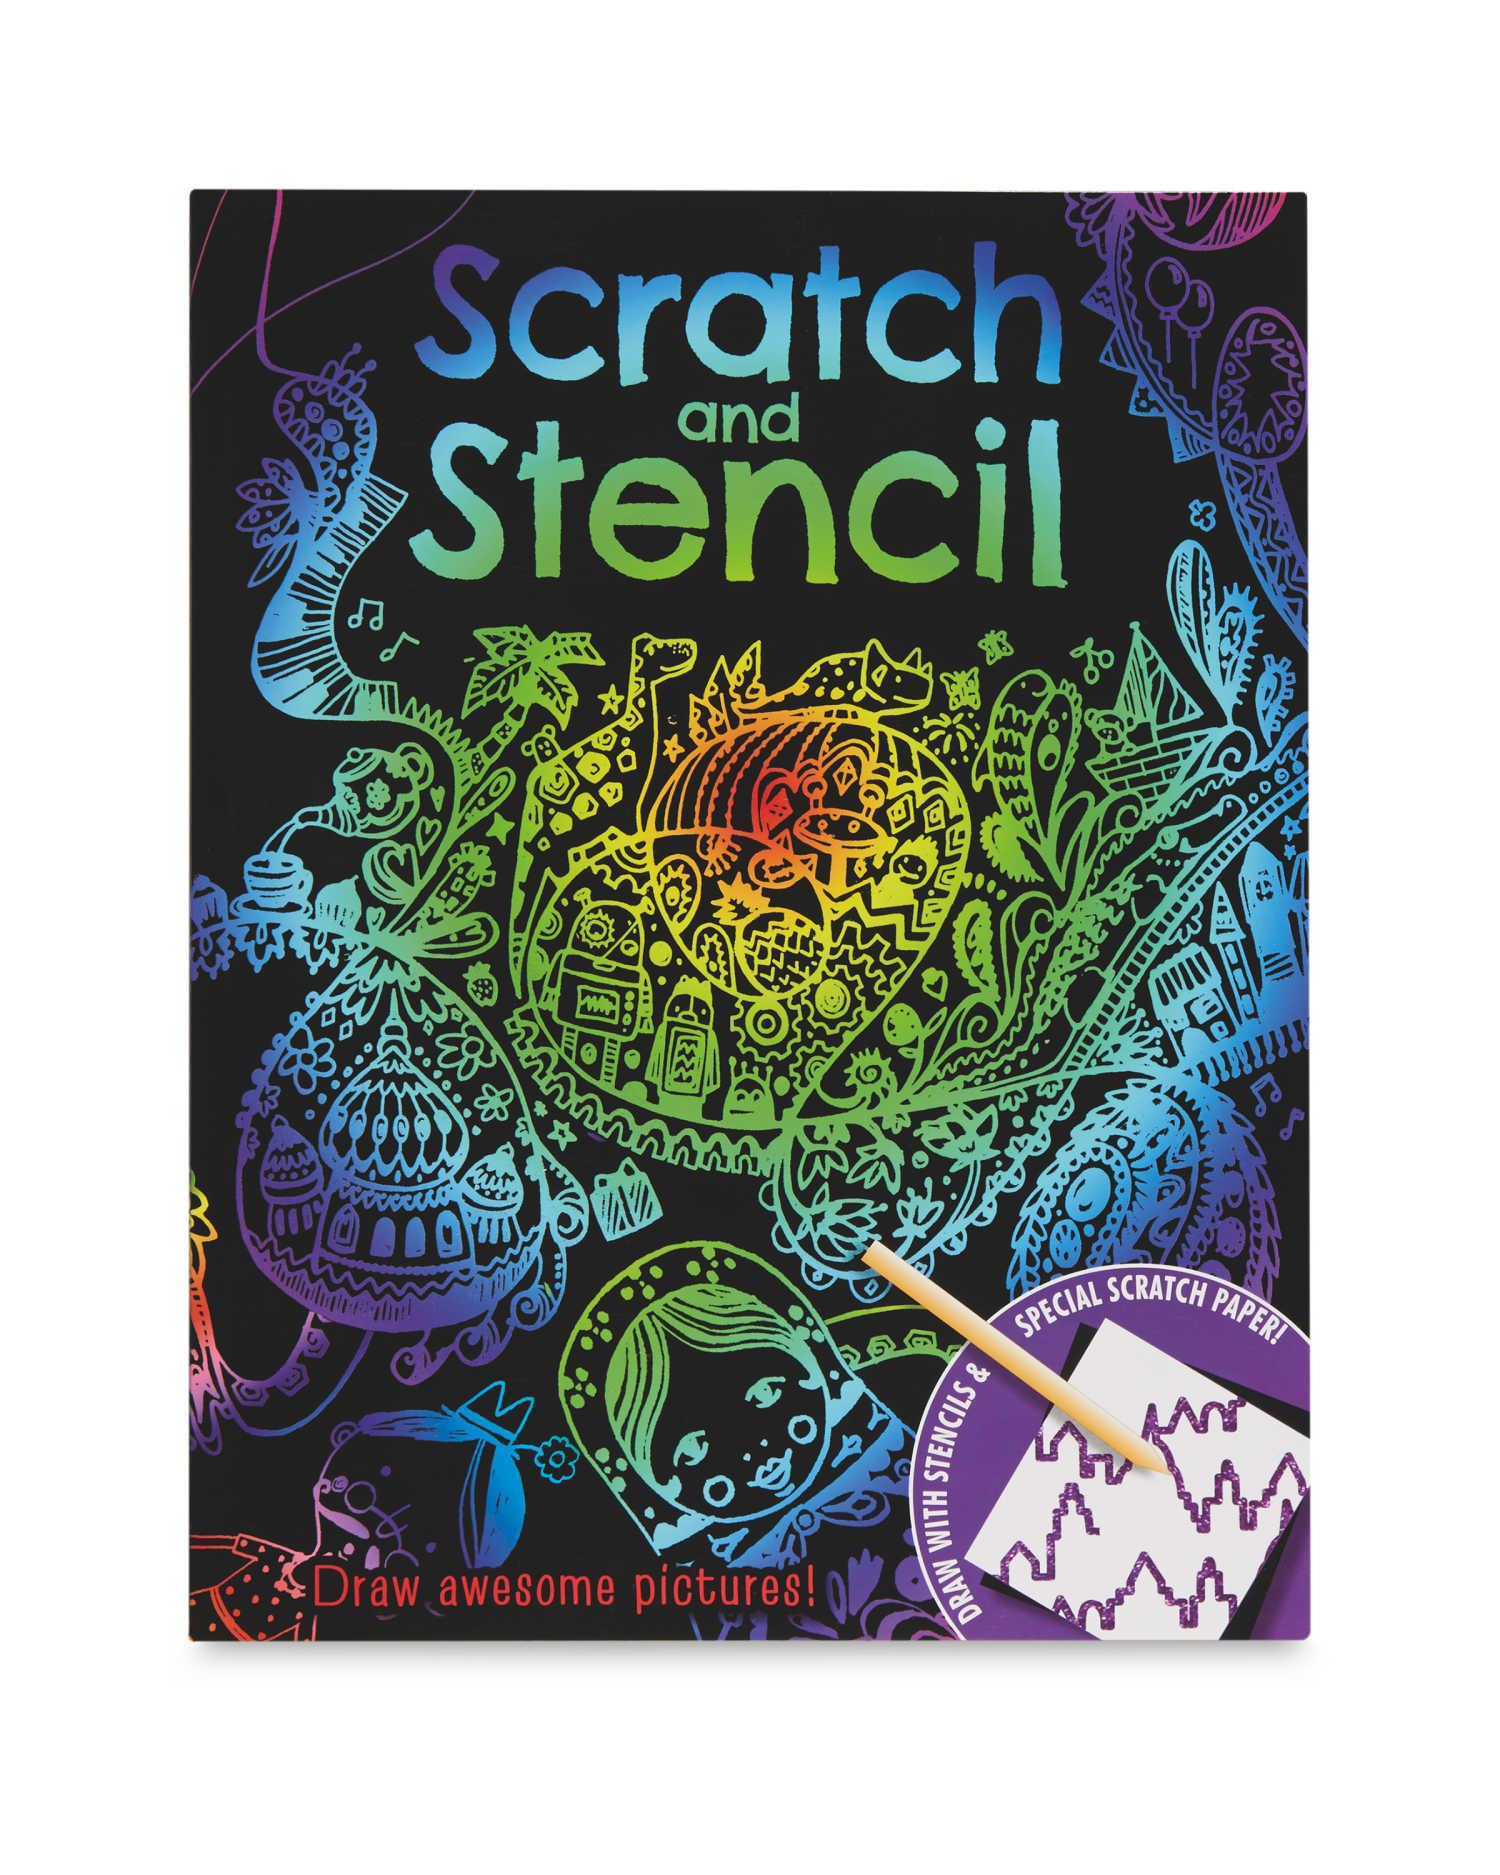 Aldi - Scratch and Stencil Books IN STORE ONLY - £2.99